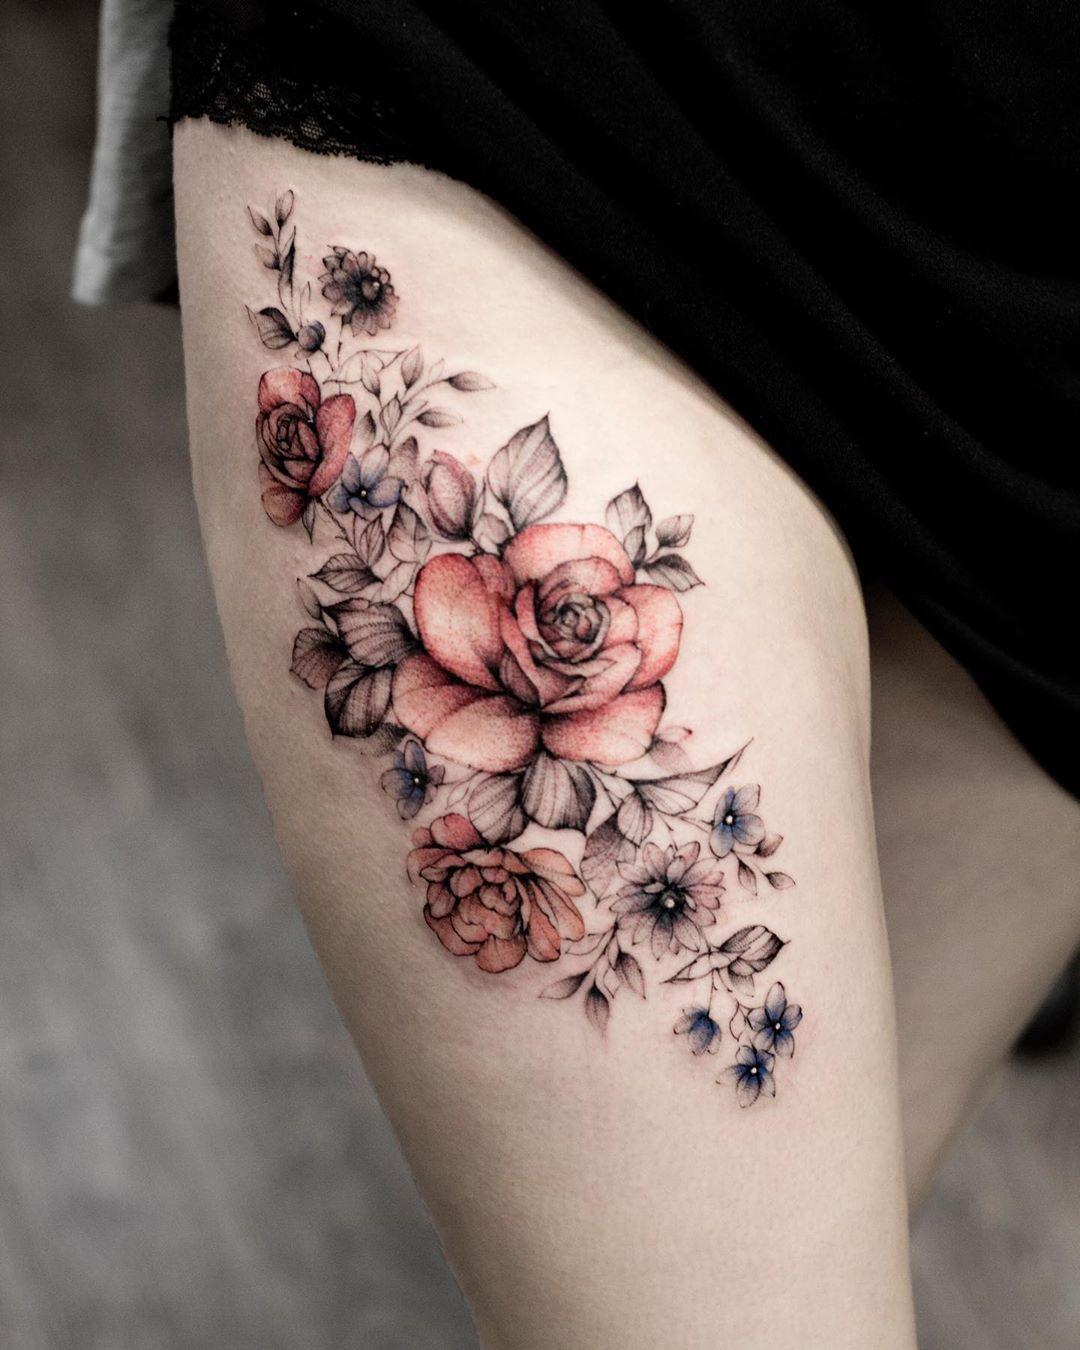 Pin By Diana Sandoval On Tattoos Tattoos Lace Tattoo Feminine Tattoos